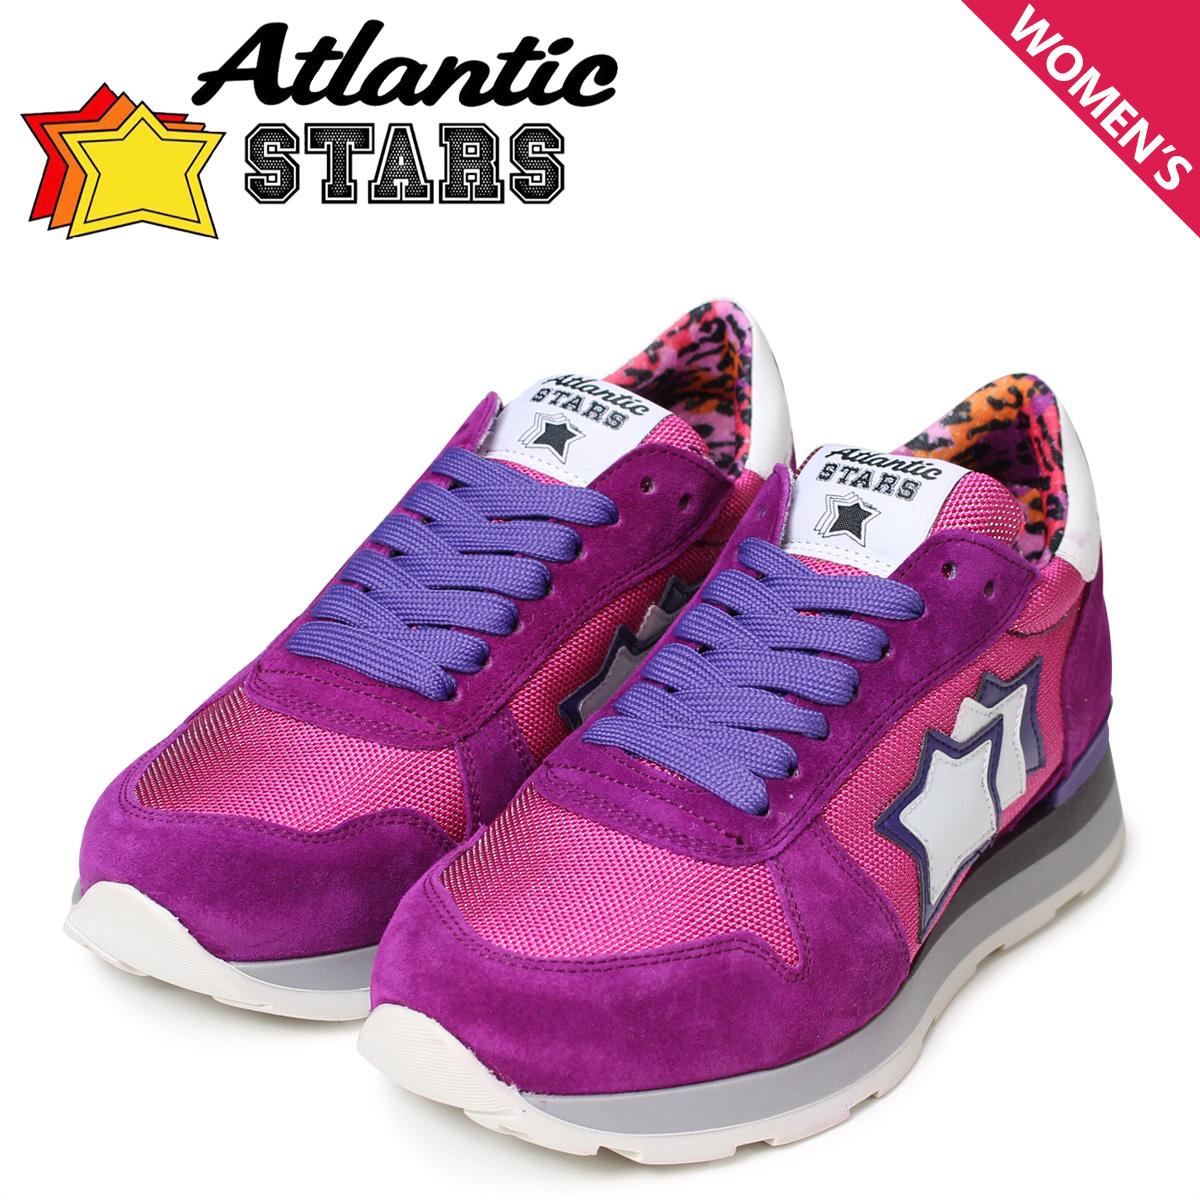 Atlantic STARS レディース スニーカー アトランティックスターズ ジェンマ GEMMA CFG-63VI 靴 ピンク パープル